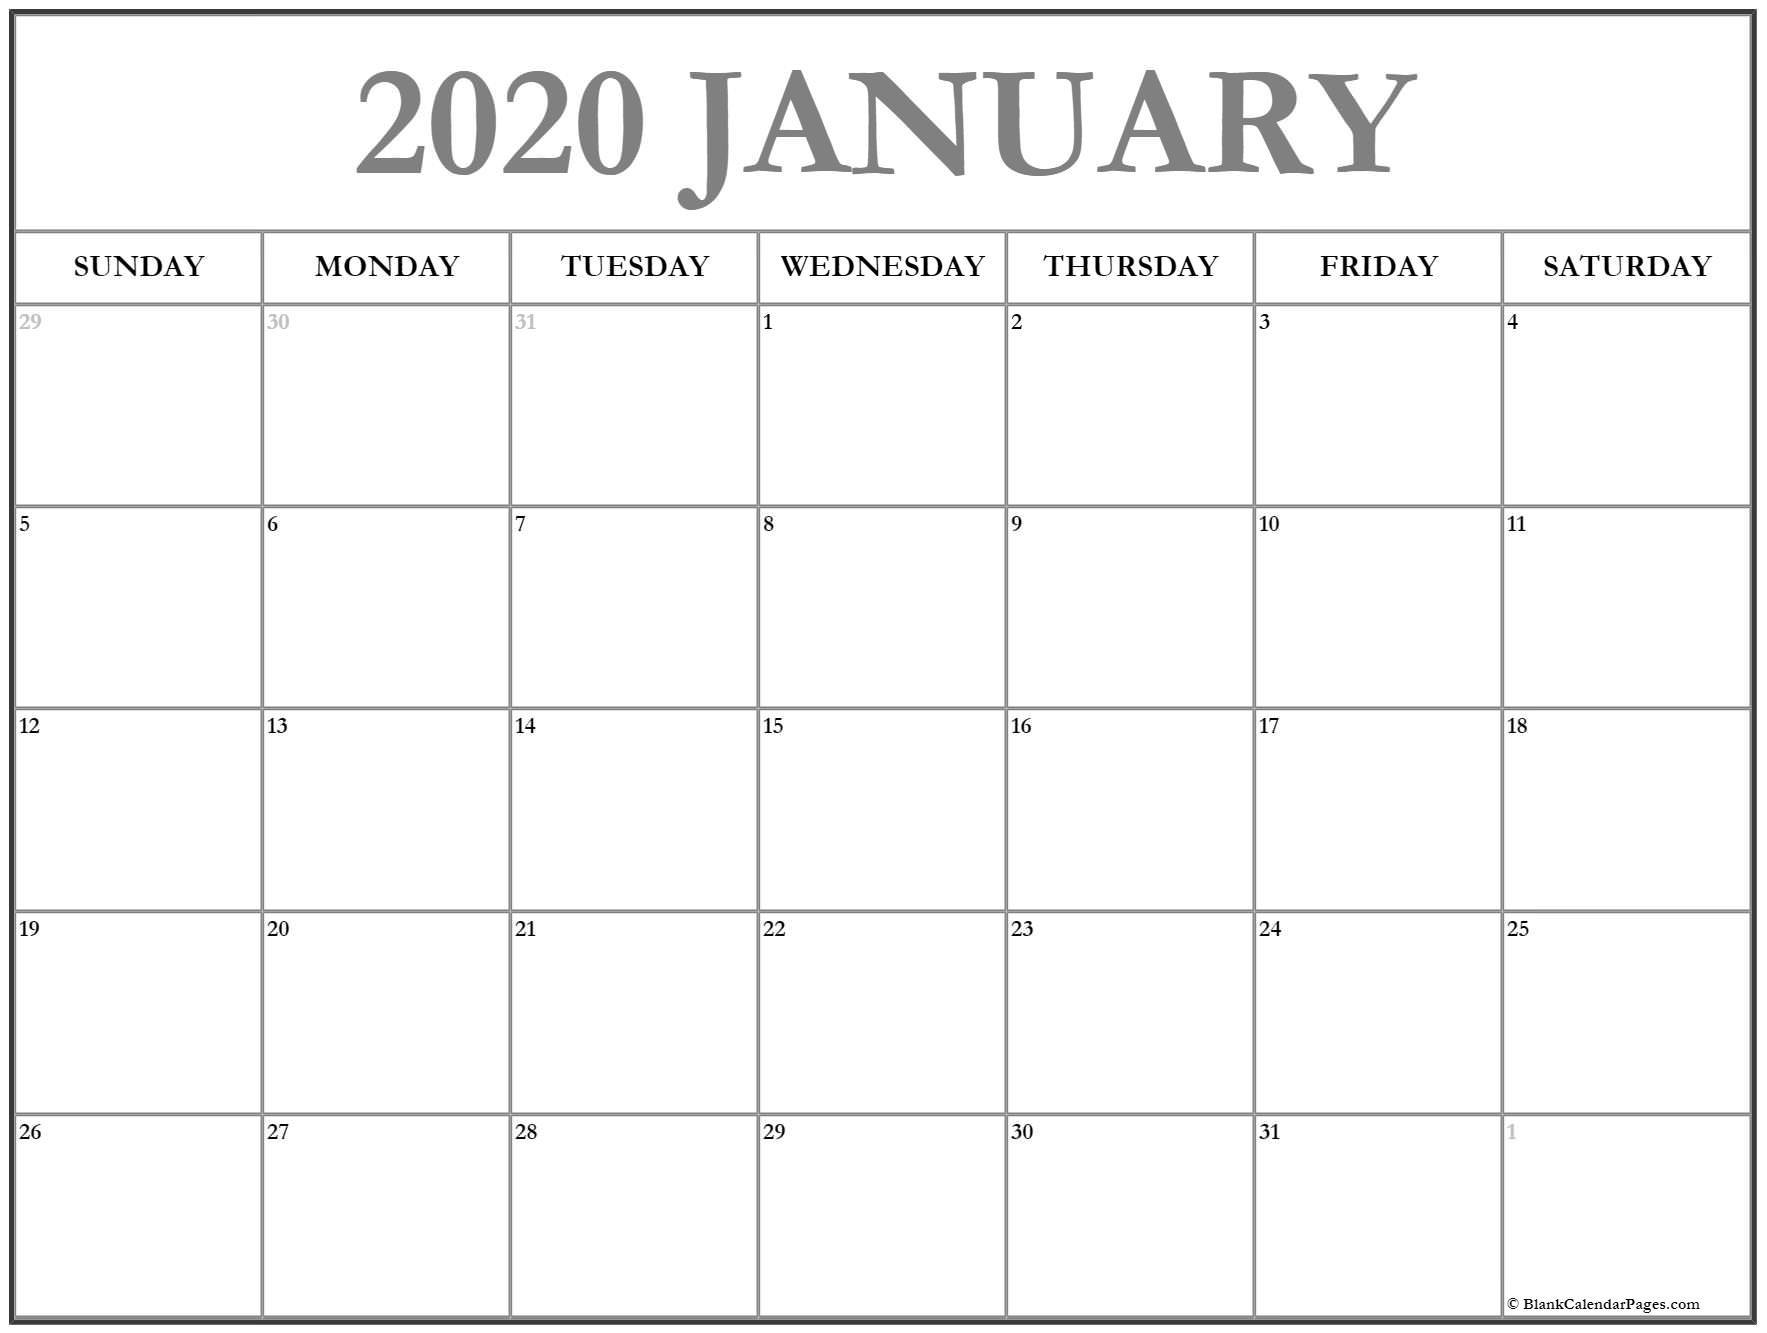 Free January 2020 Calendar Printable January 2020 Calendar